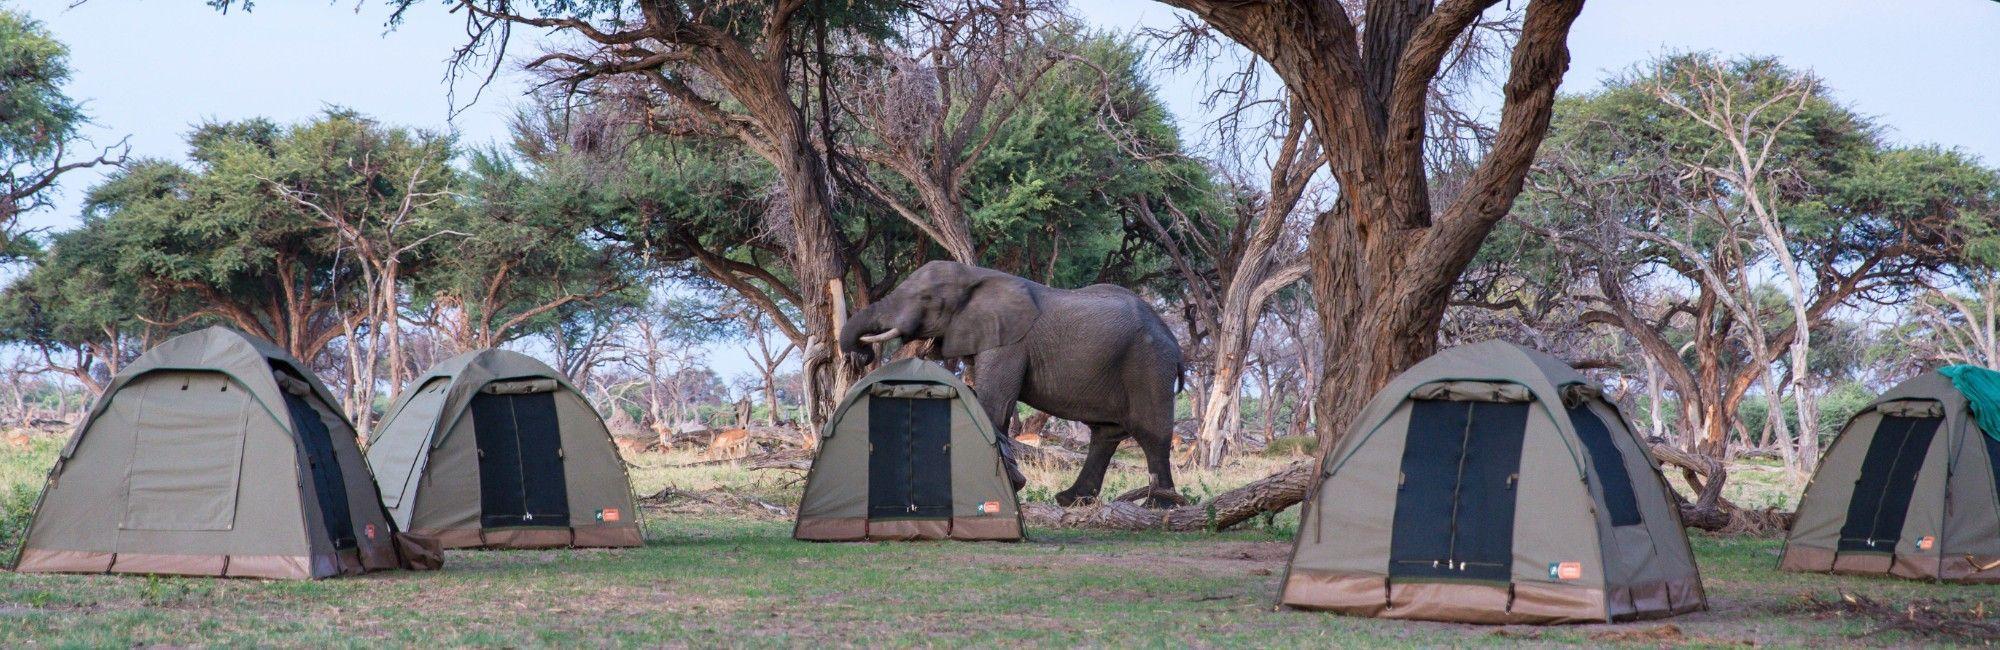 Kampeersafari Botswana Highlights